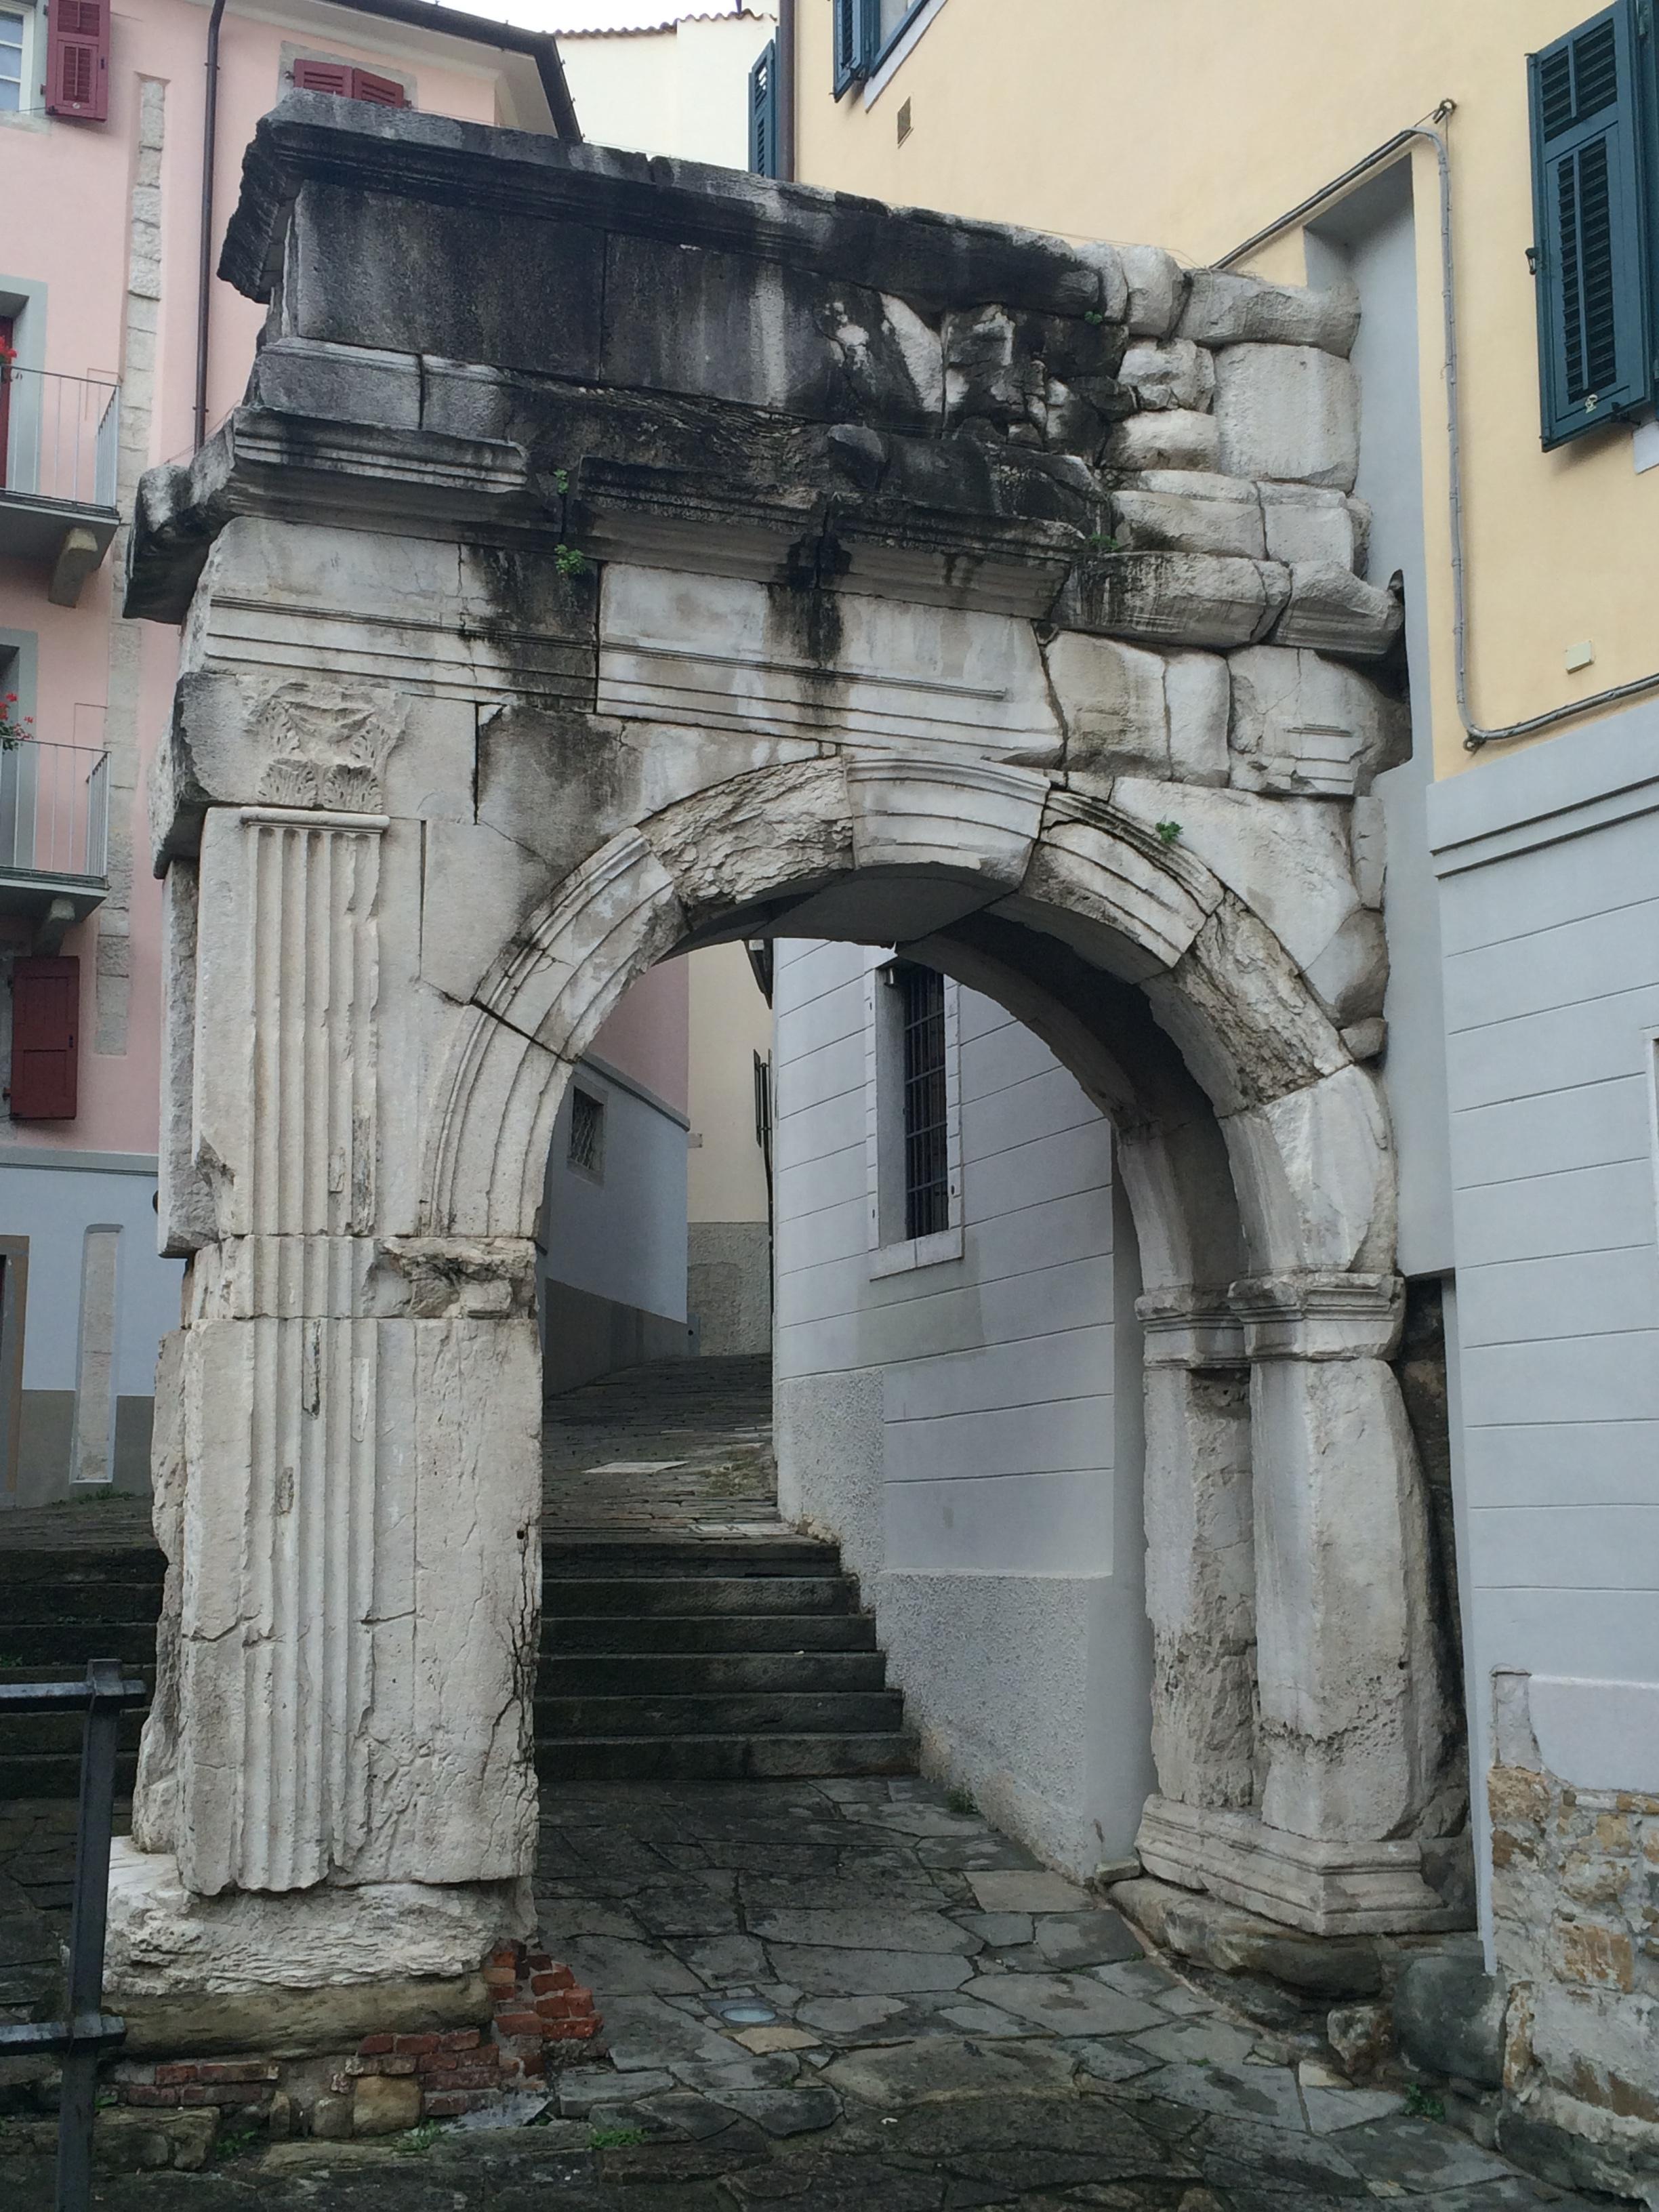 Richard's Arch